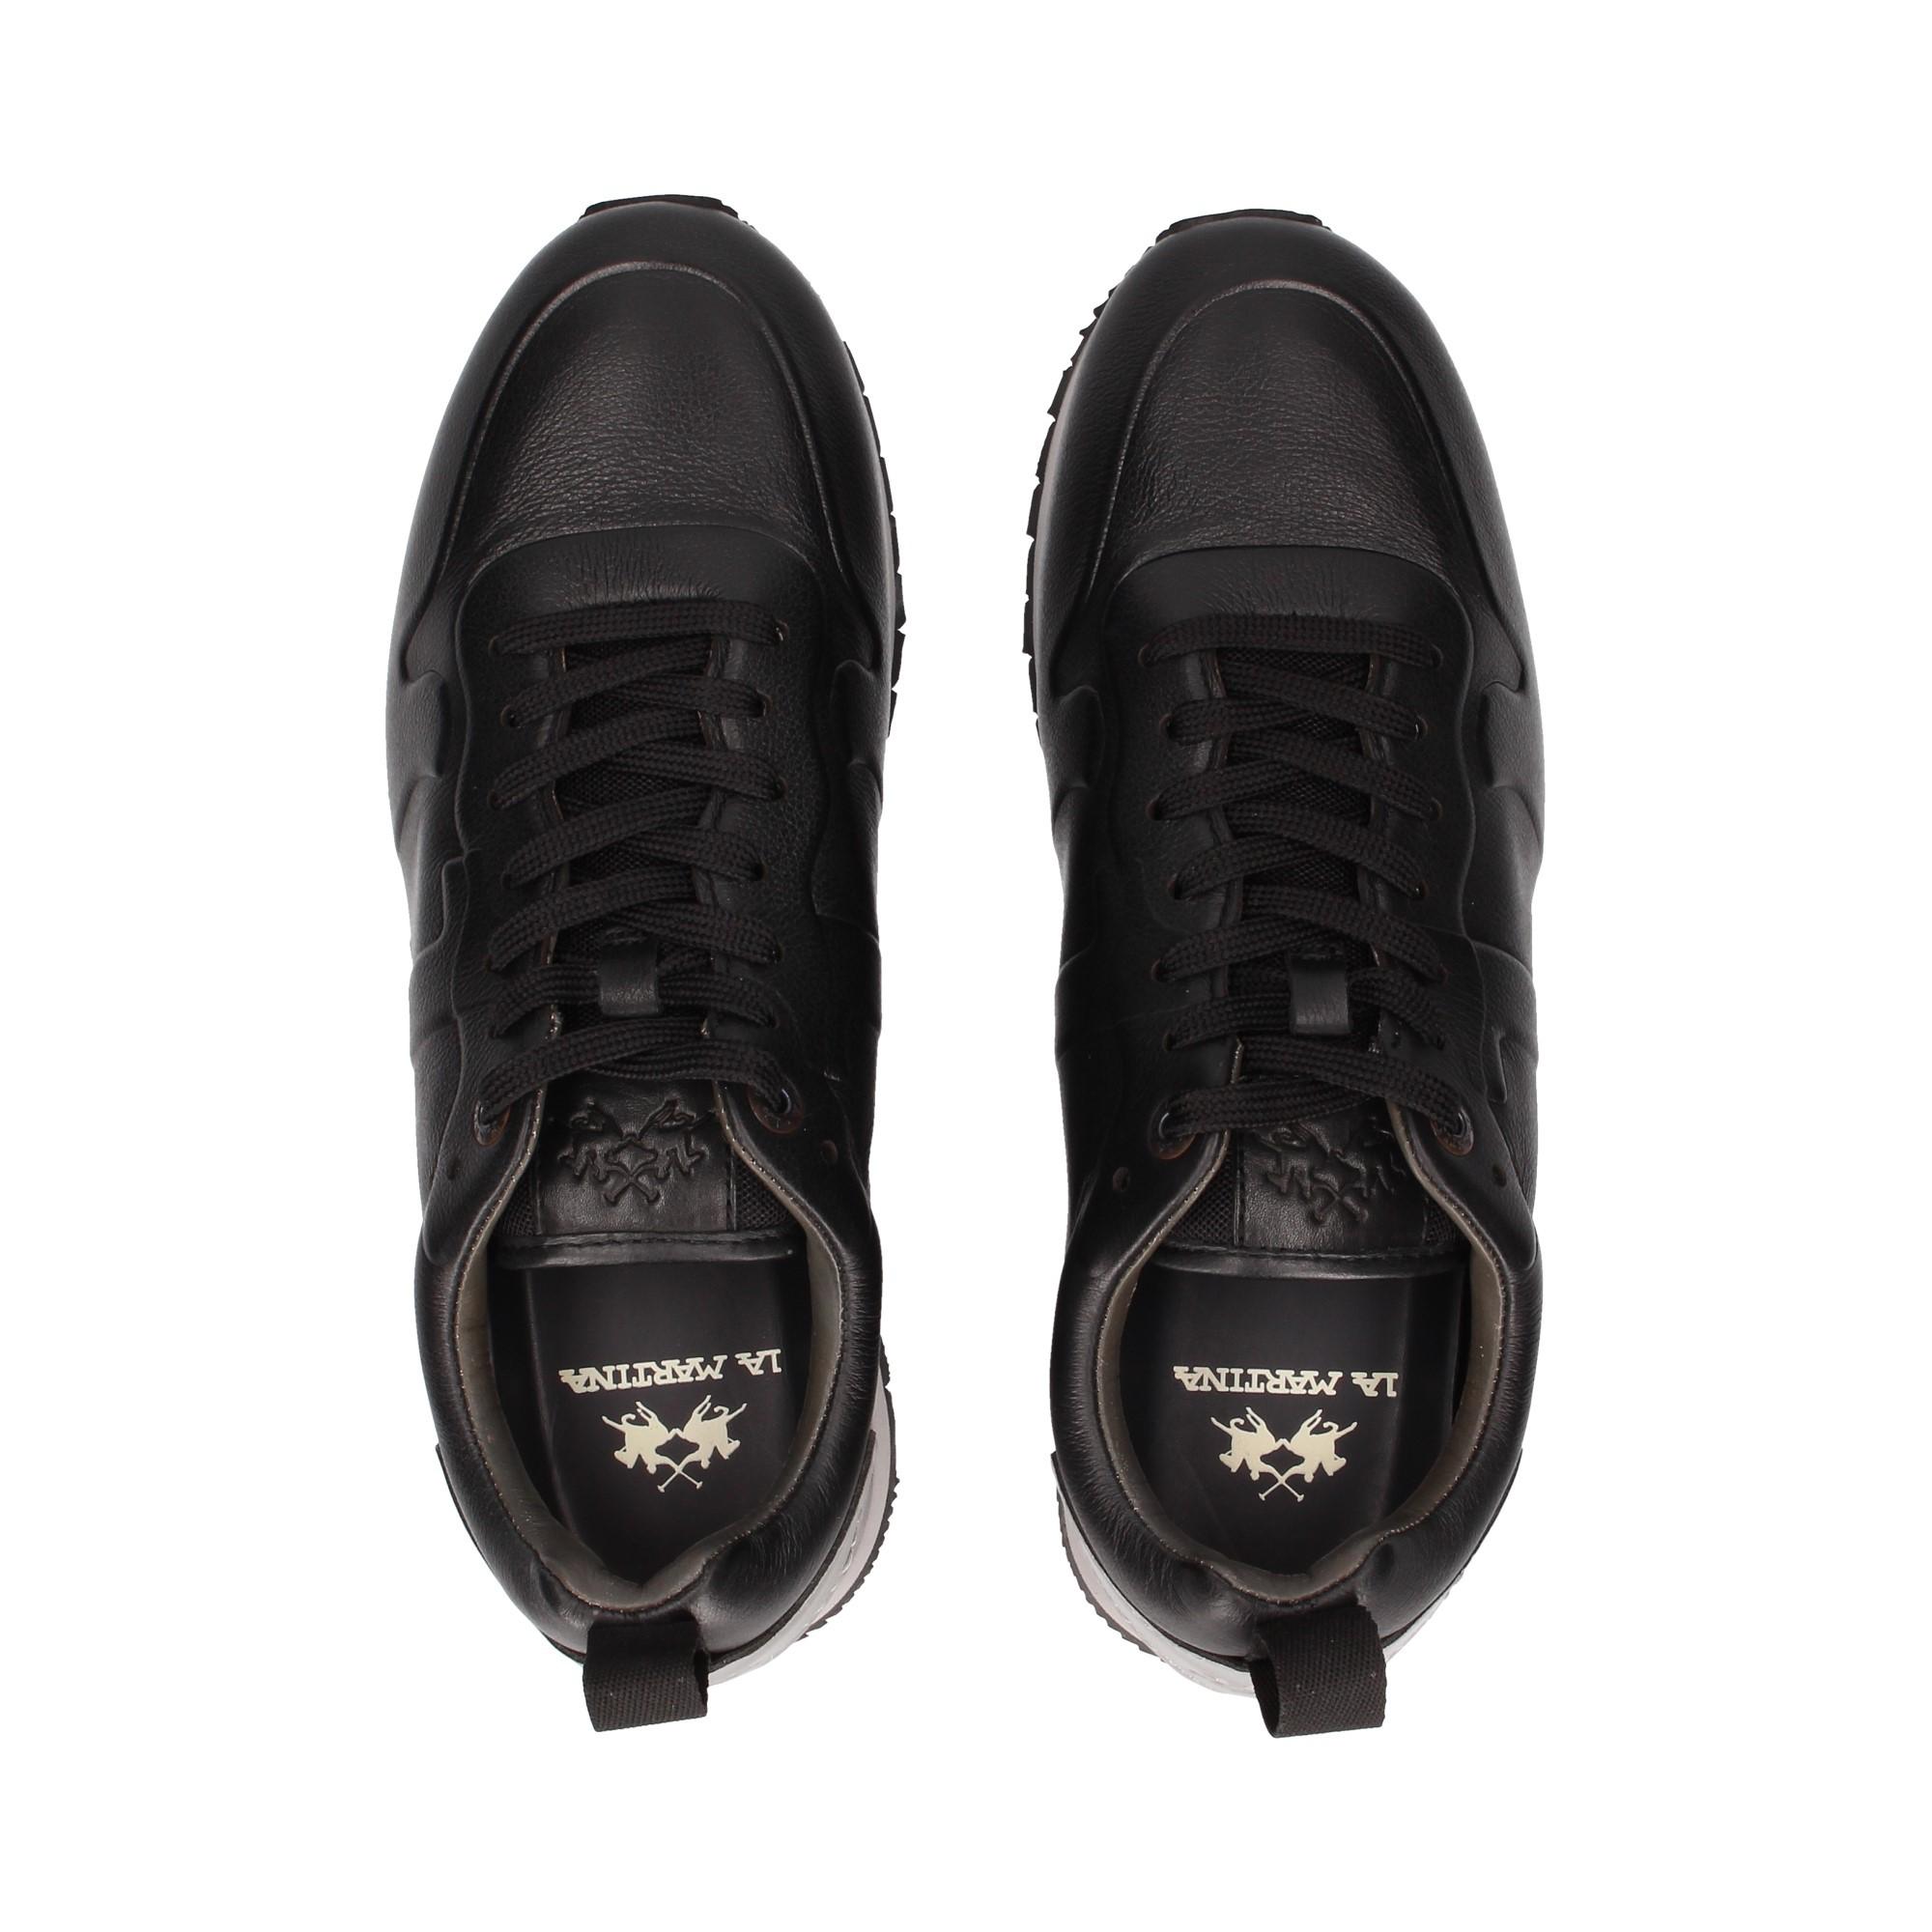 deportivo-acordonado-piel-negro